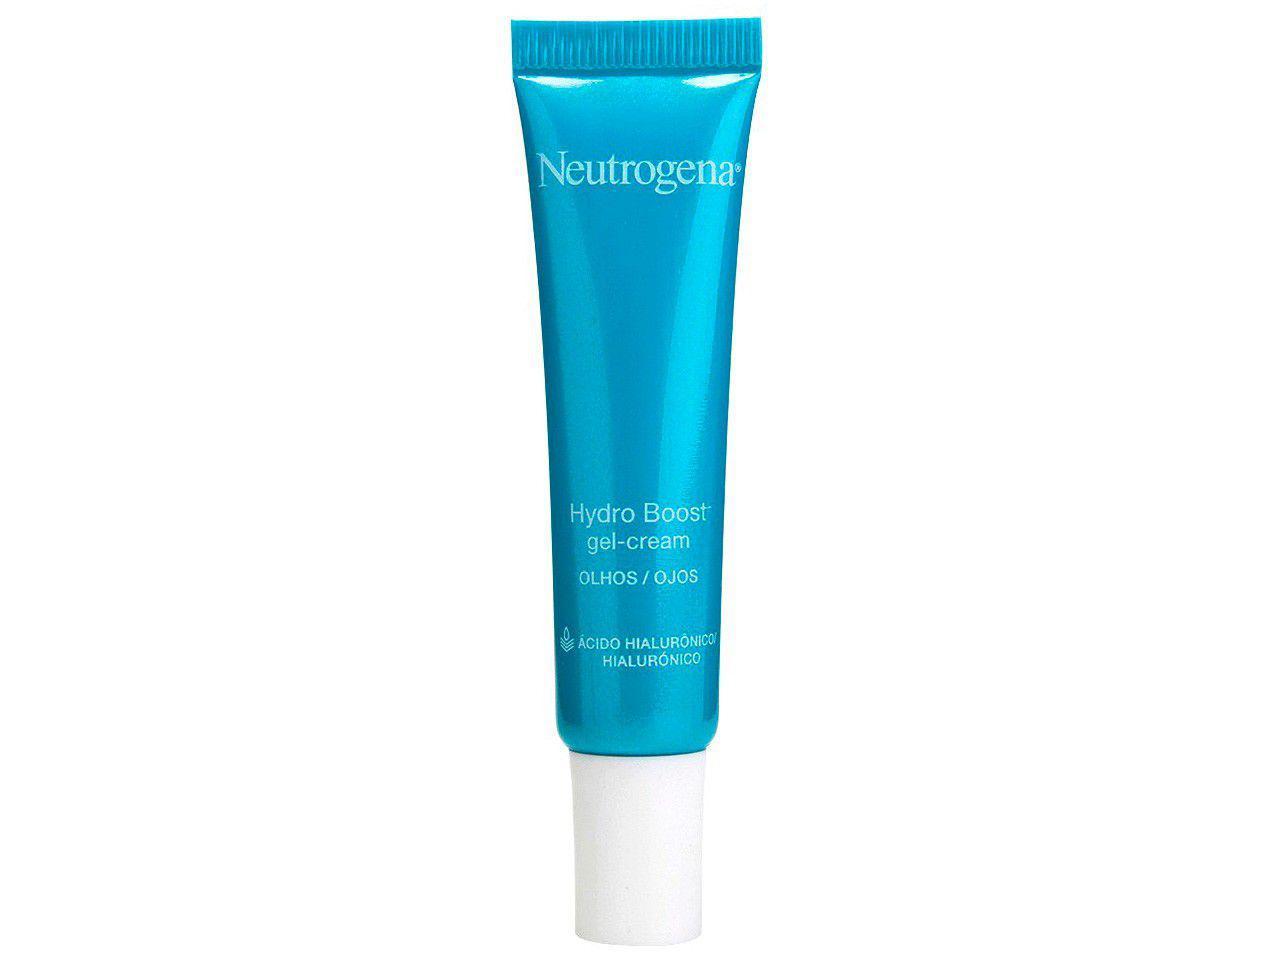 Creme Hidratante para os Olhos Neutrogena - Hydro Boost Gel Cream 15g